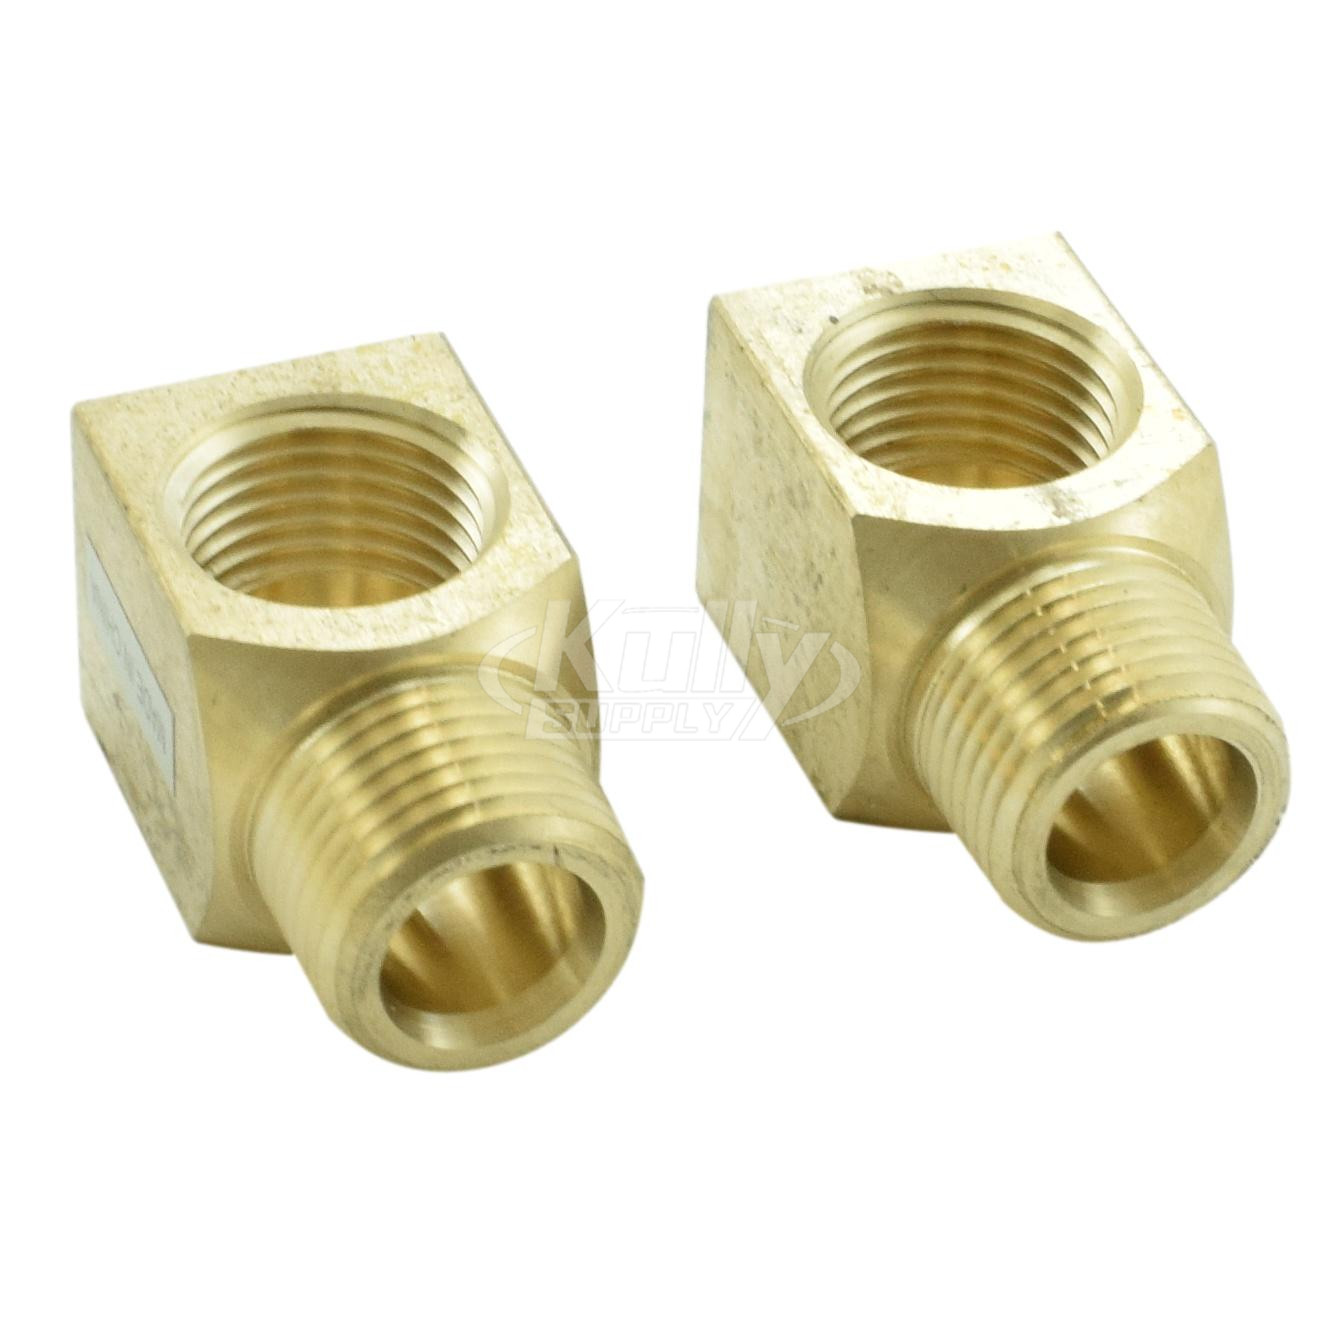 t s brass b 1100 k installation kit for workboard wall mount faucets